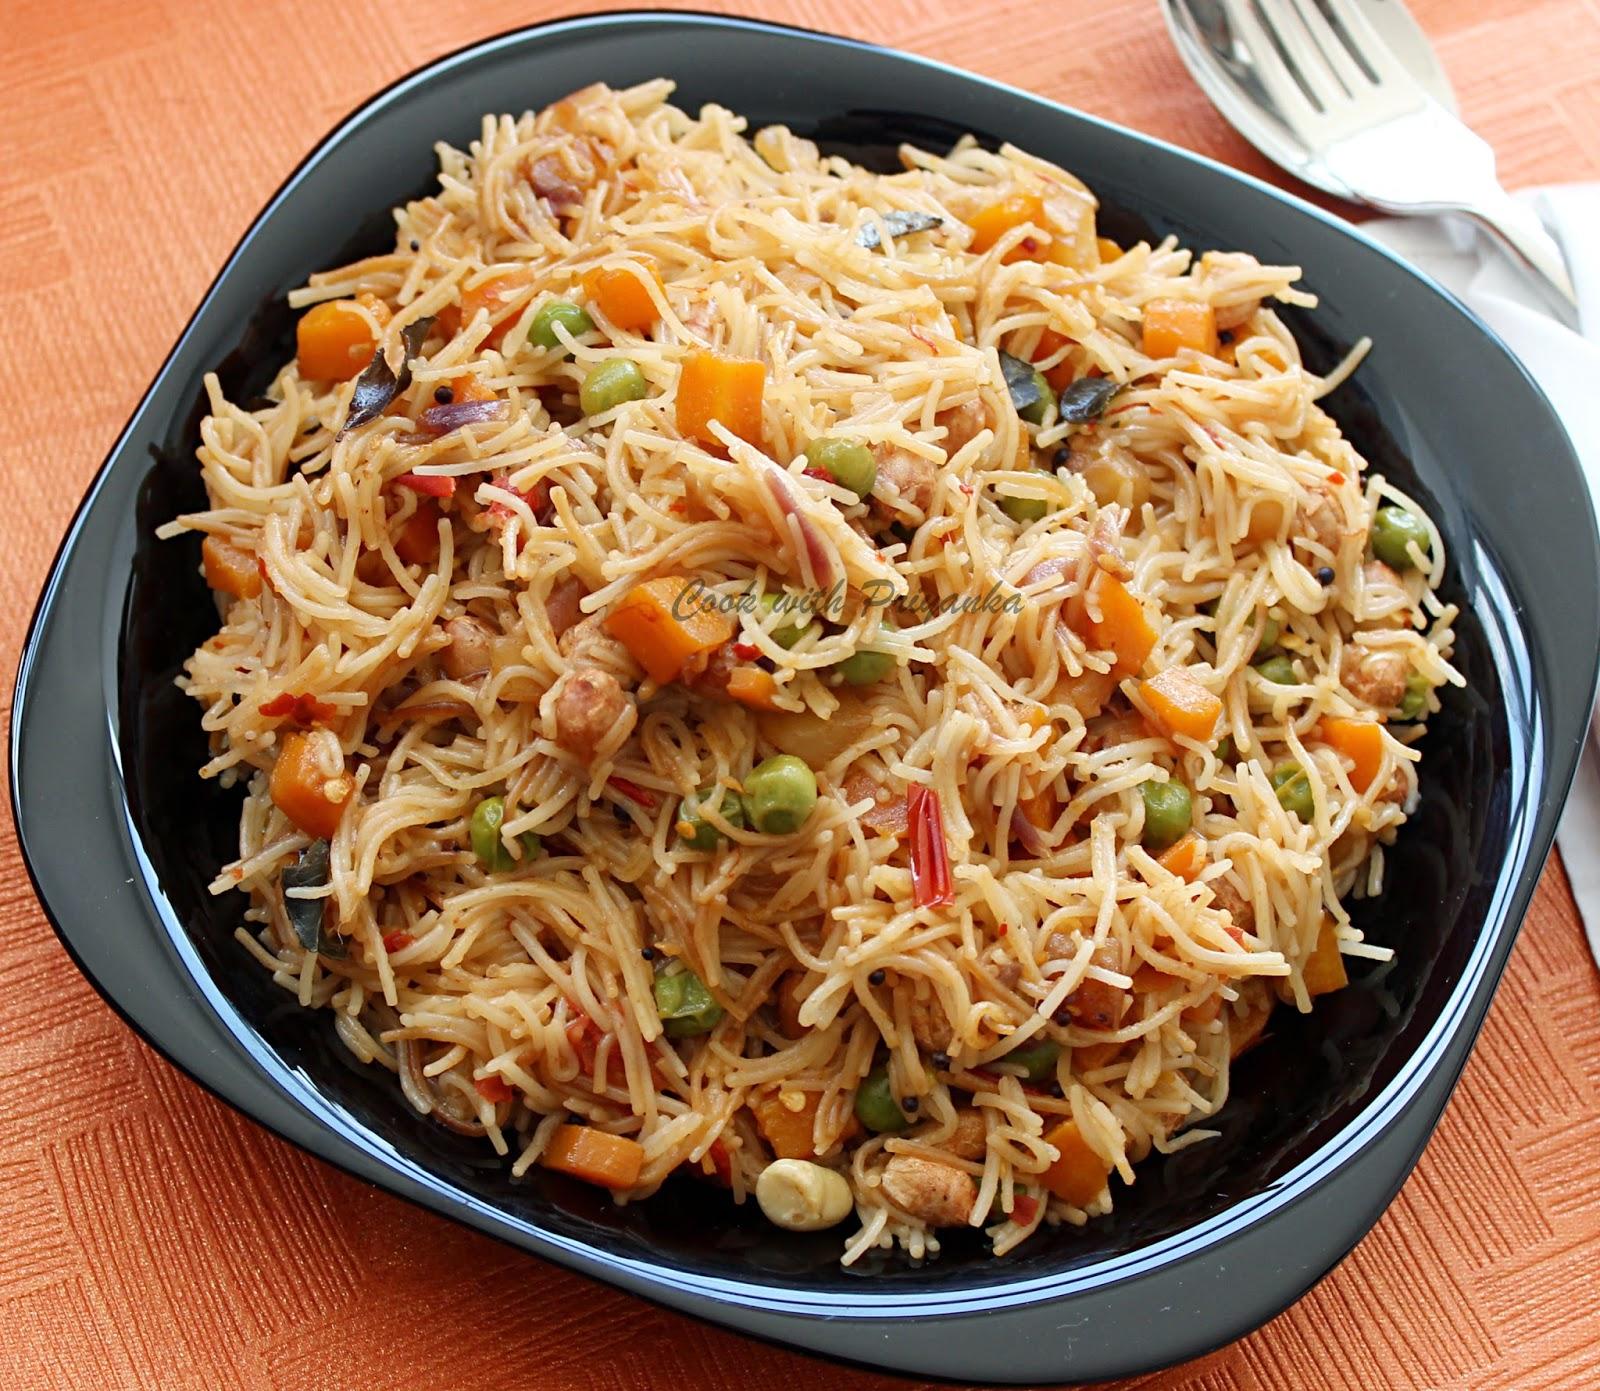 http://cookwithpriyankavarma.blogspot.co.uk/2014/07/vermicelli-upmavegetable-semiya.html